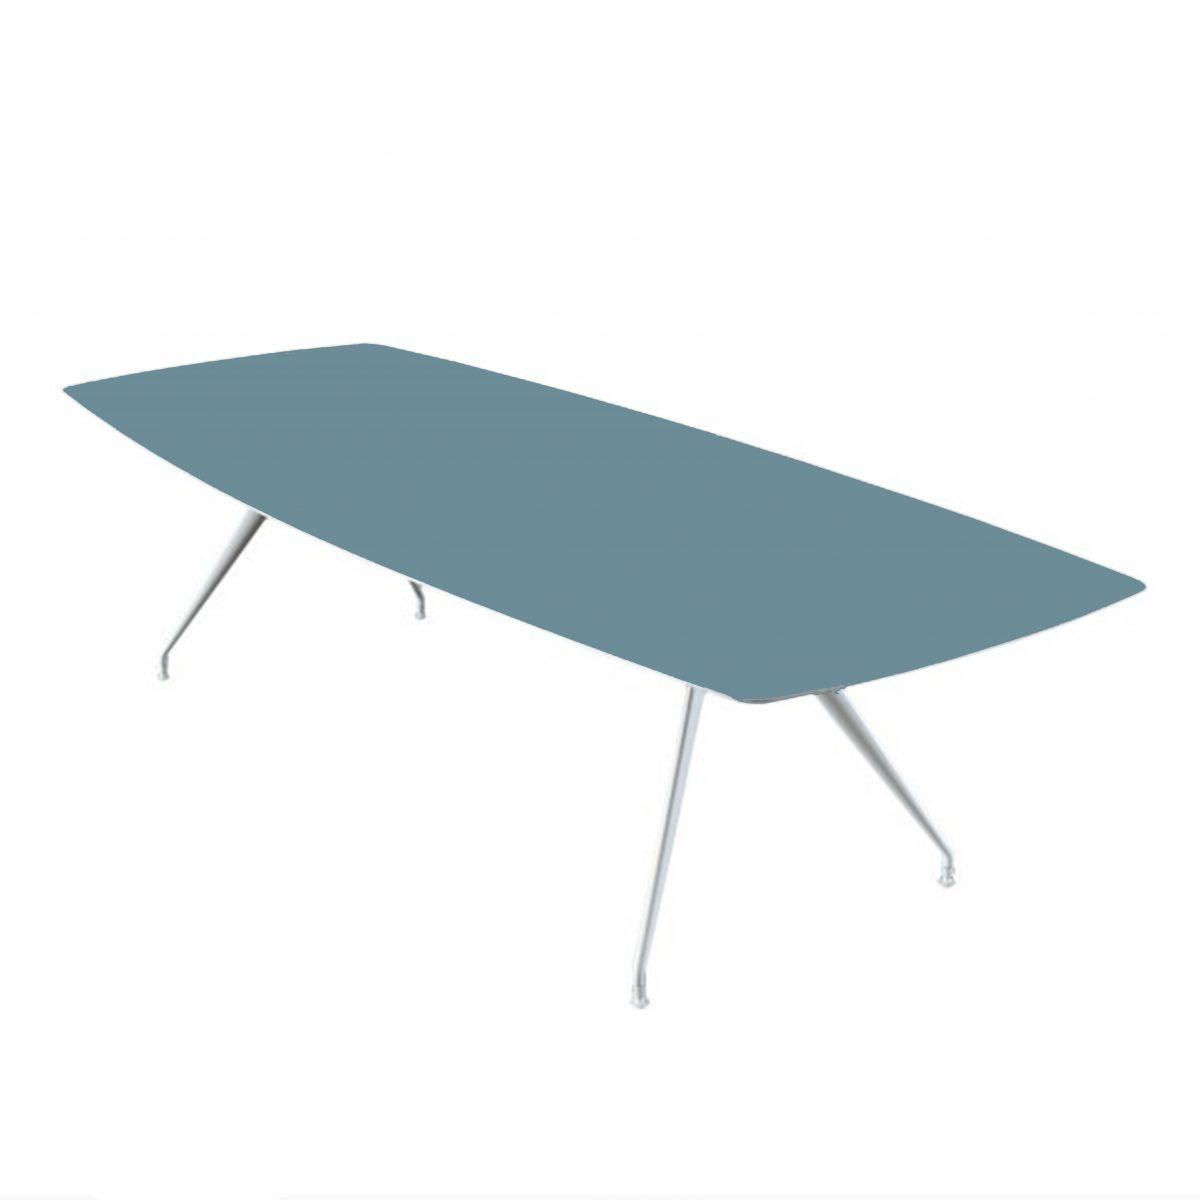 "Giuseppe Bavuso ""Manta"" table |Rimadesio"